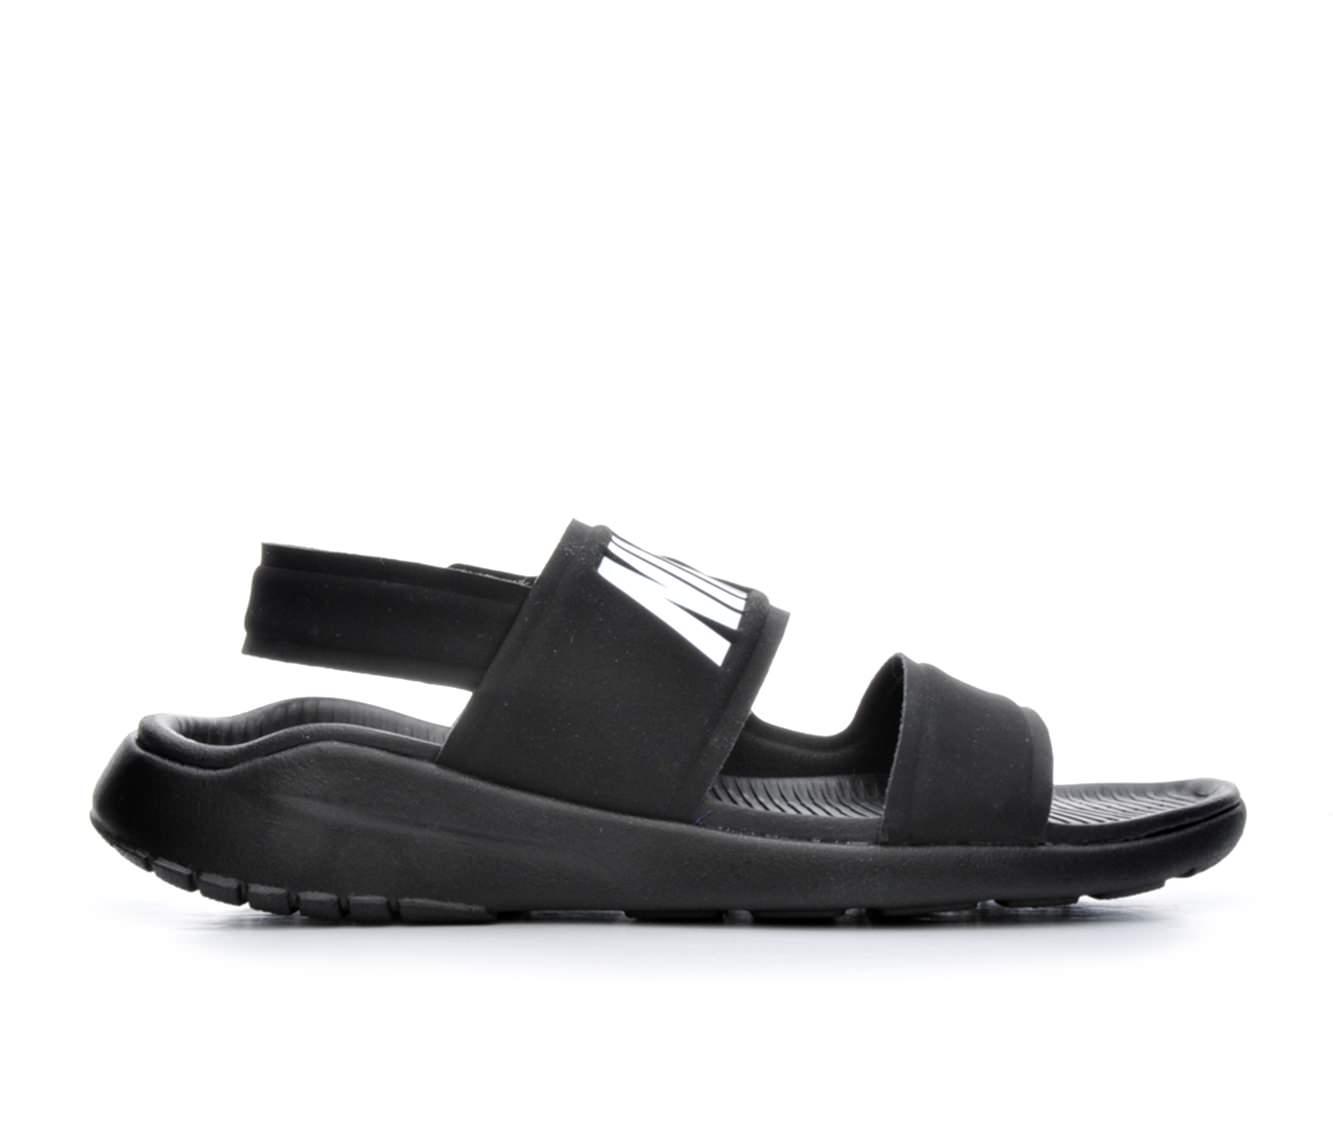 Women's Nike Tanjun Sandal Sandals (Black)